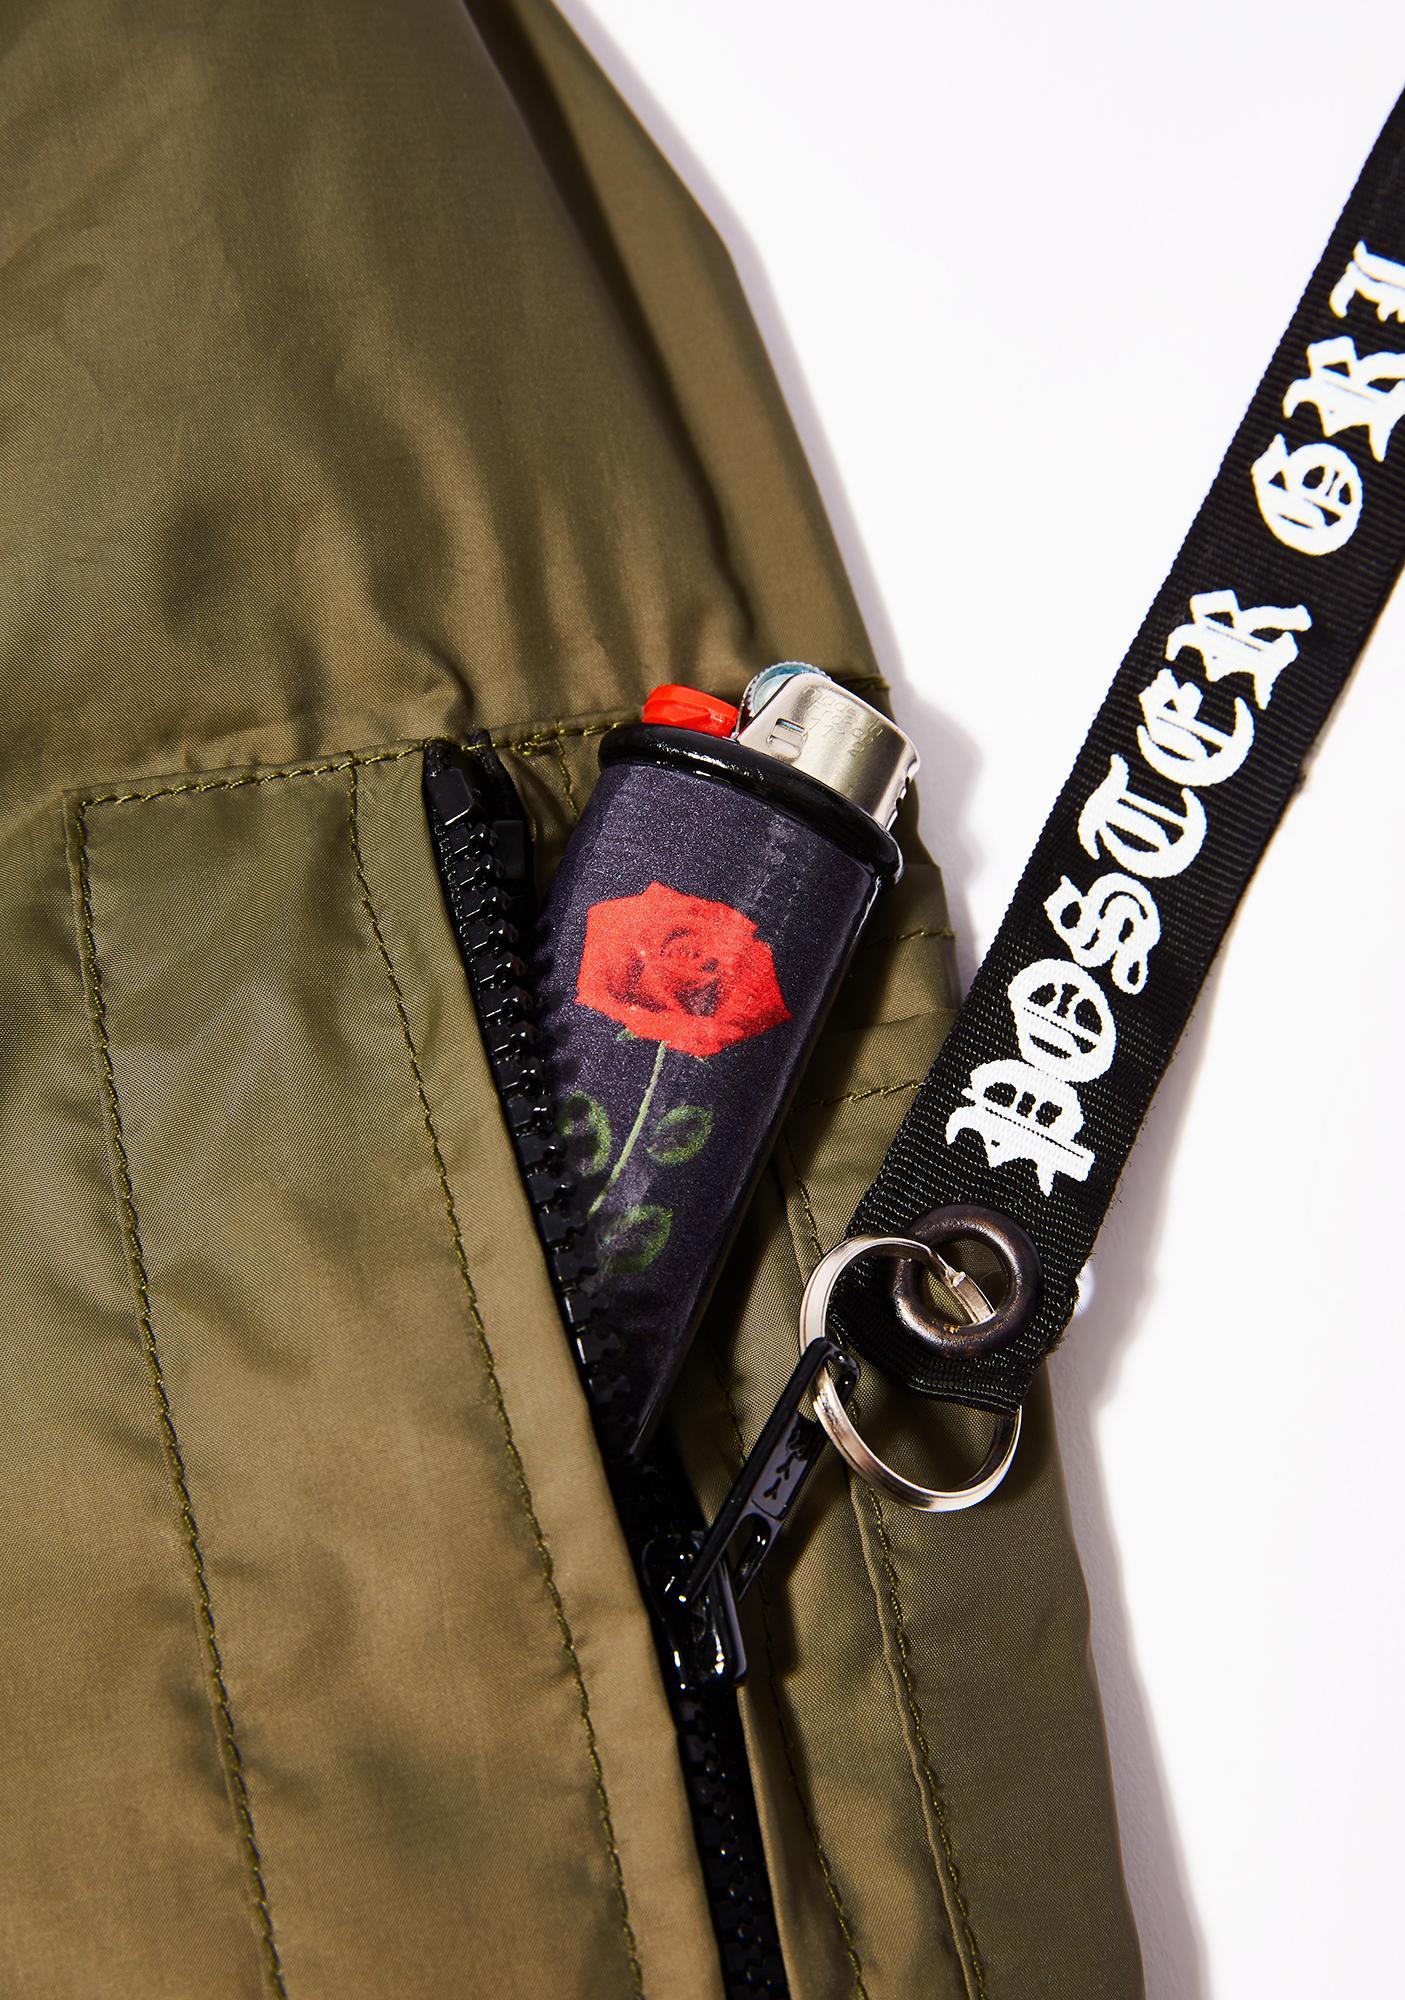 My Bubblegum Fantasy Black Rose Lighter Case